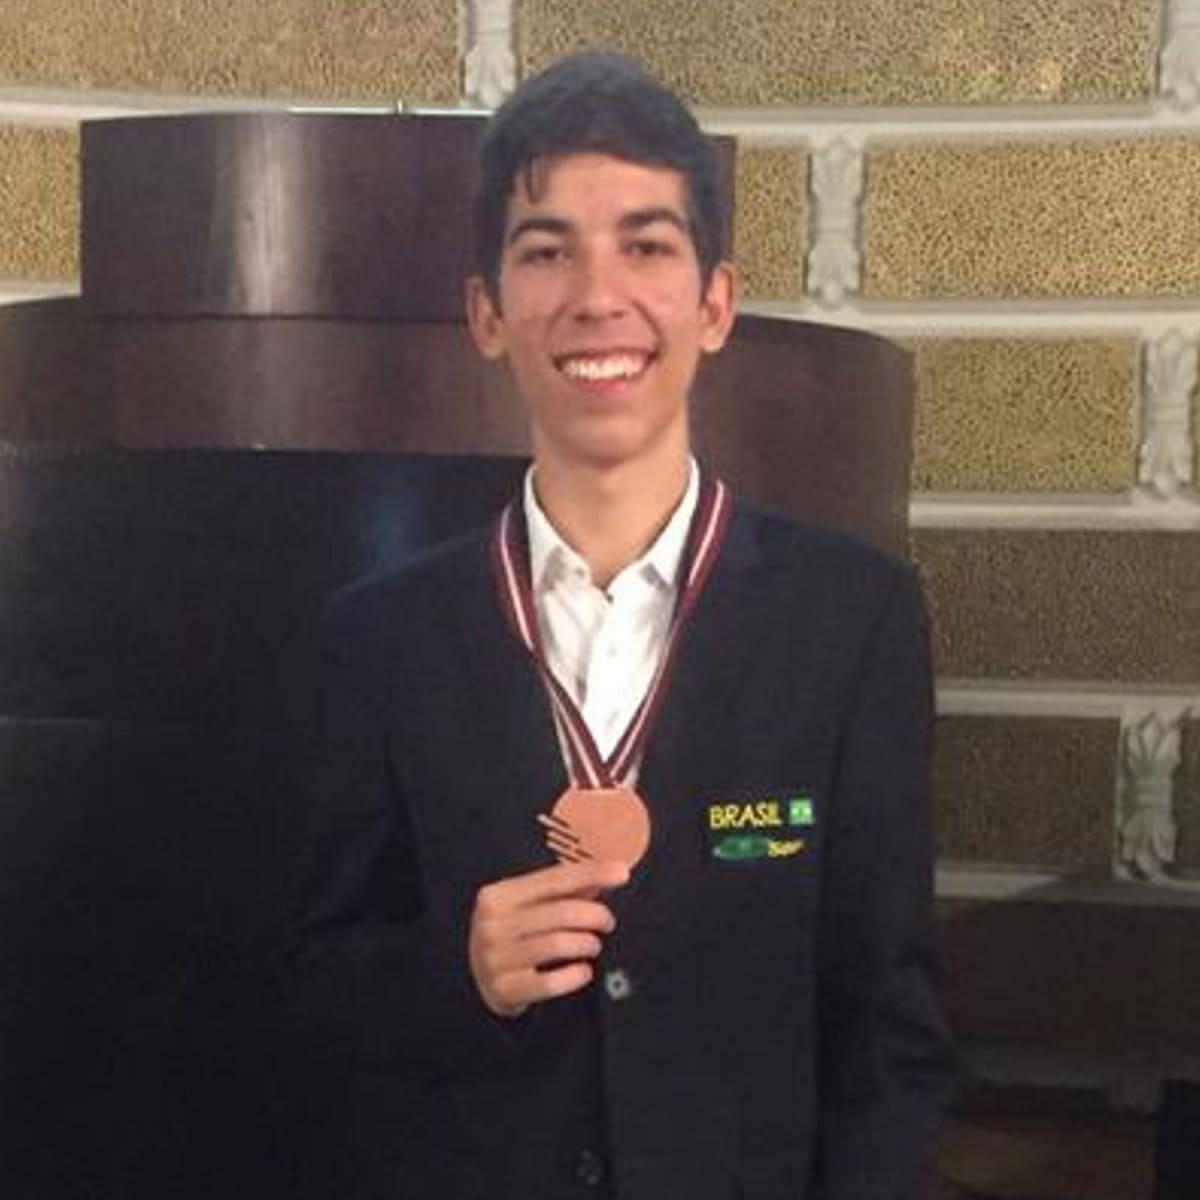 Aluno do Colégio Etapa conquista medalha de bronze na Olimpíada Europeia de Física (EuPhO)